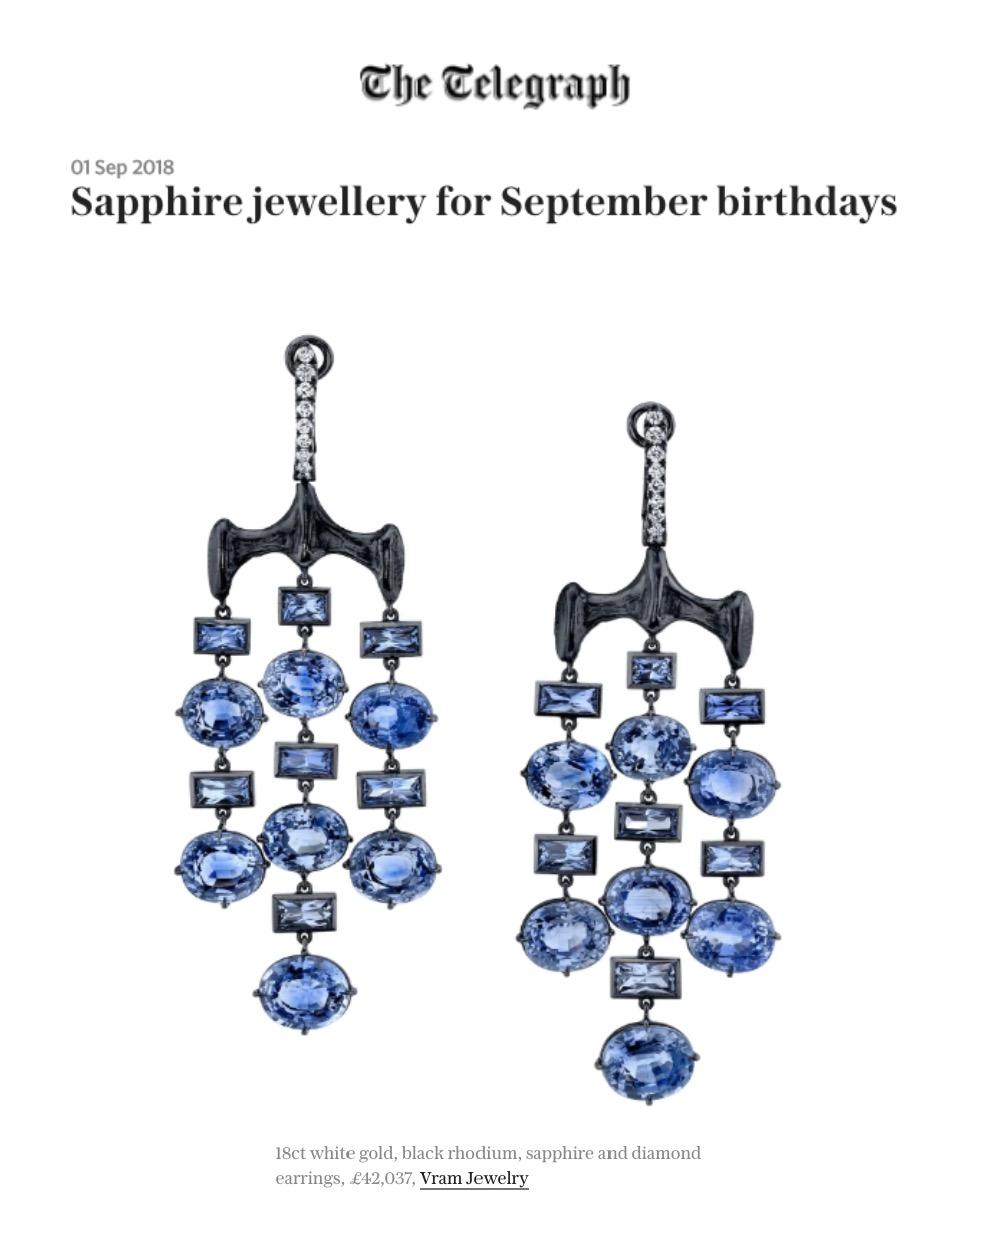 VRAM Jewelry Chrona Sapphire Earrings Telegraph UK